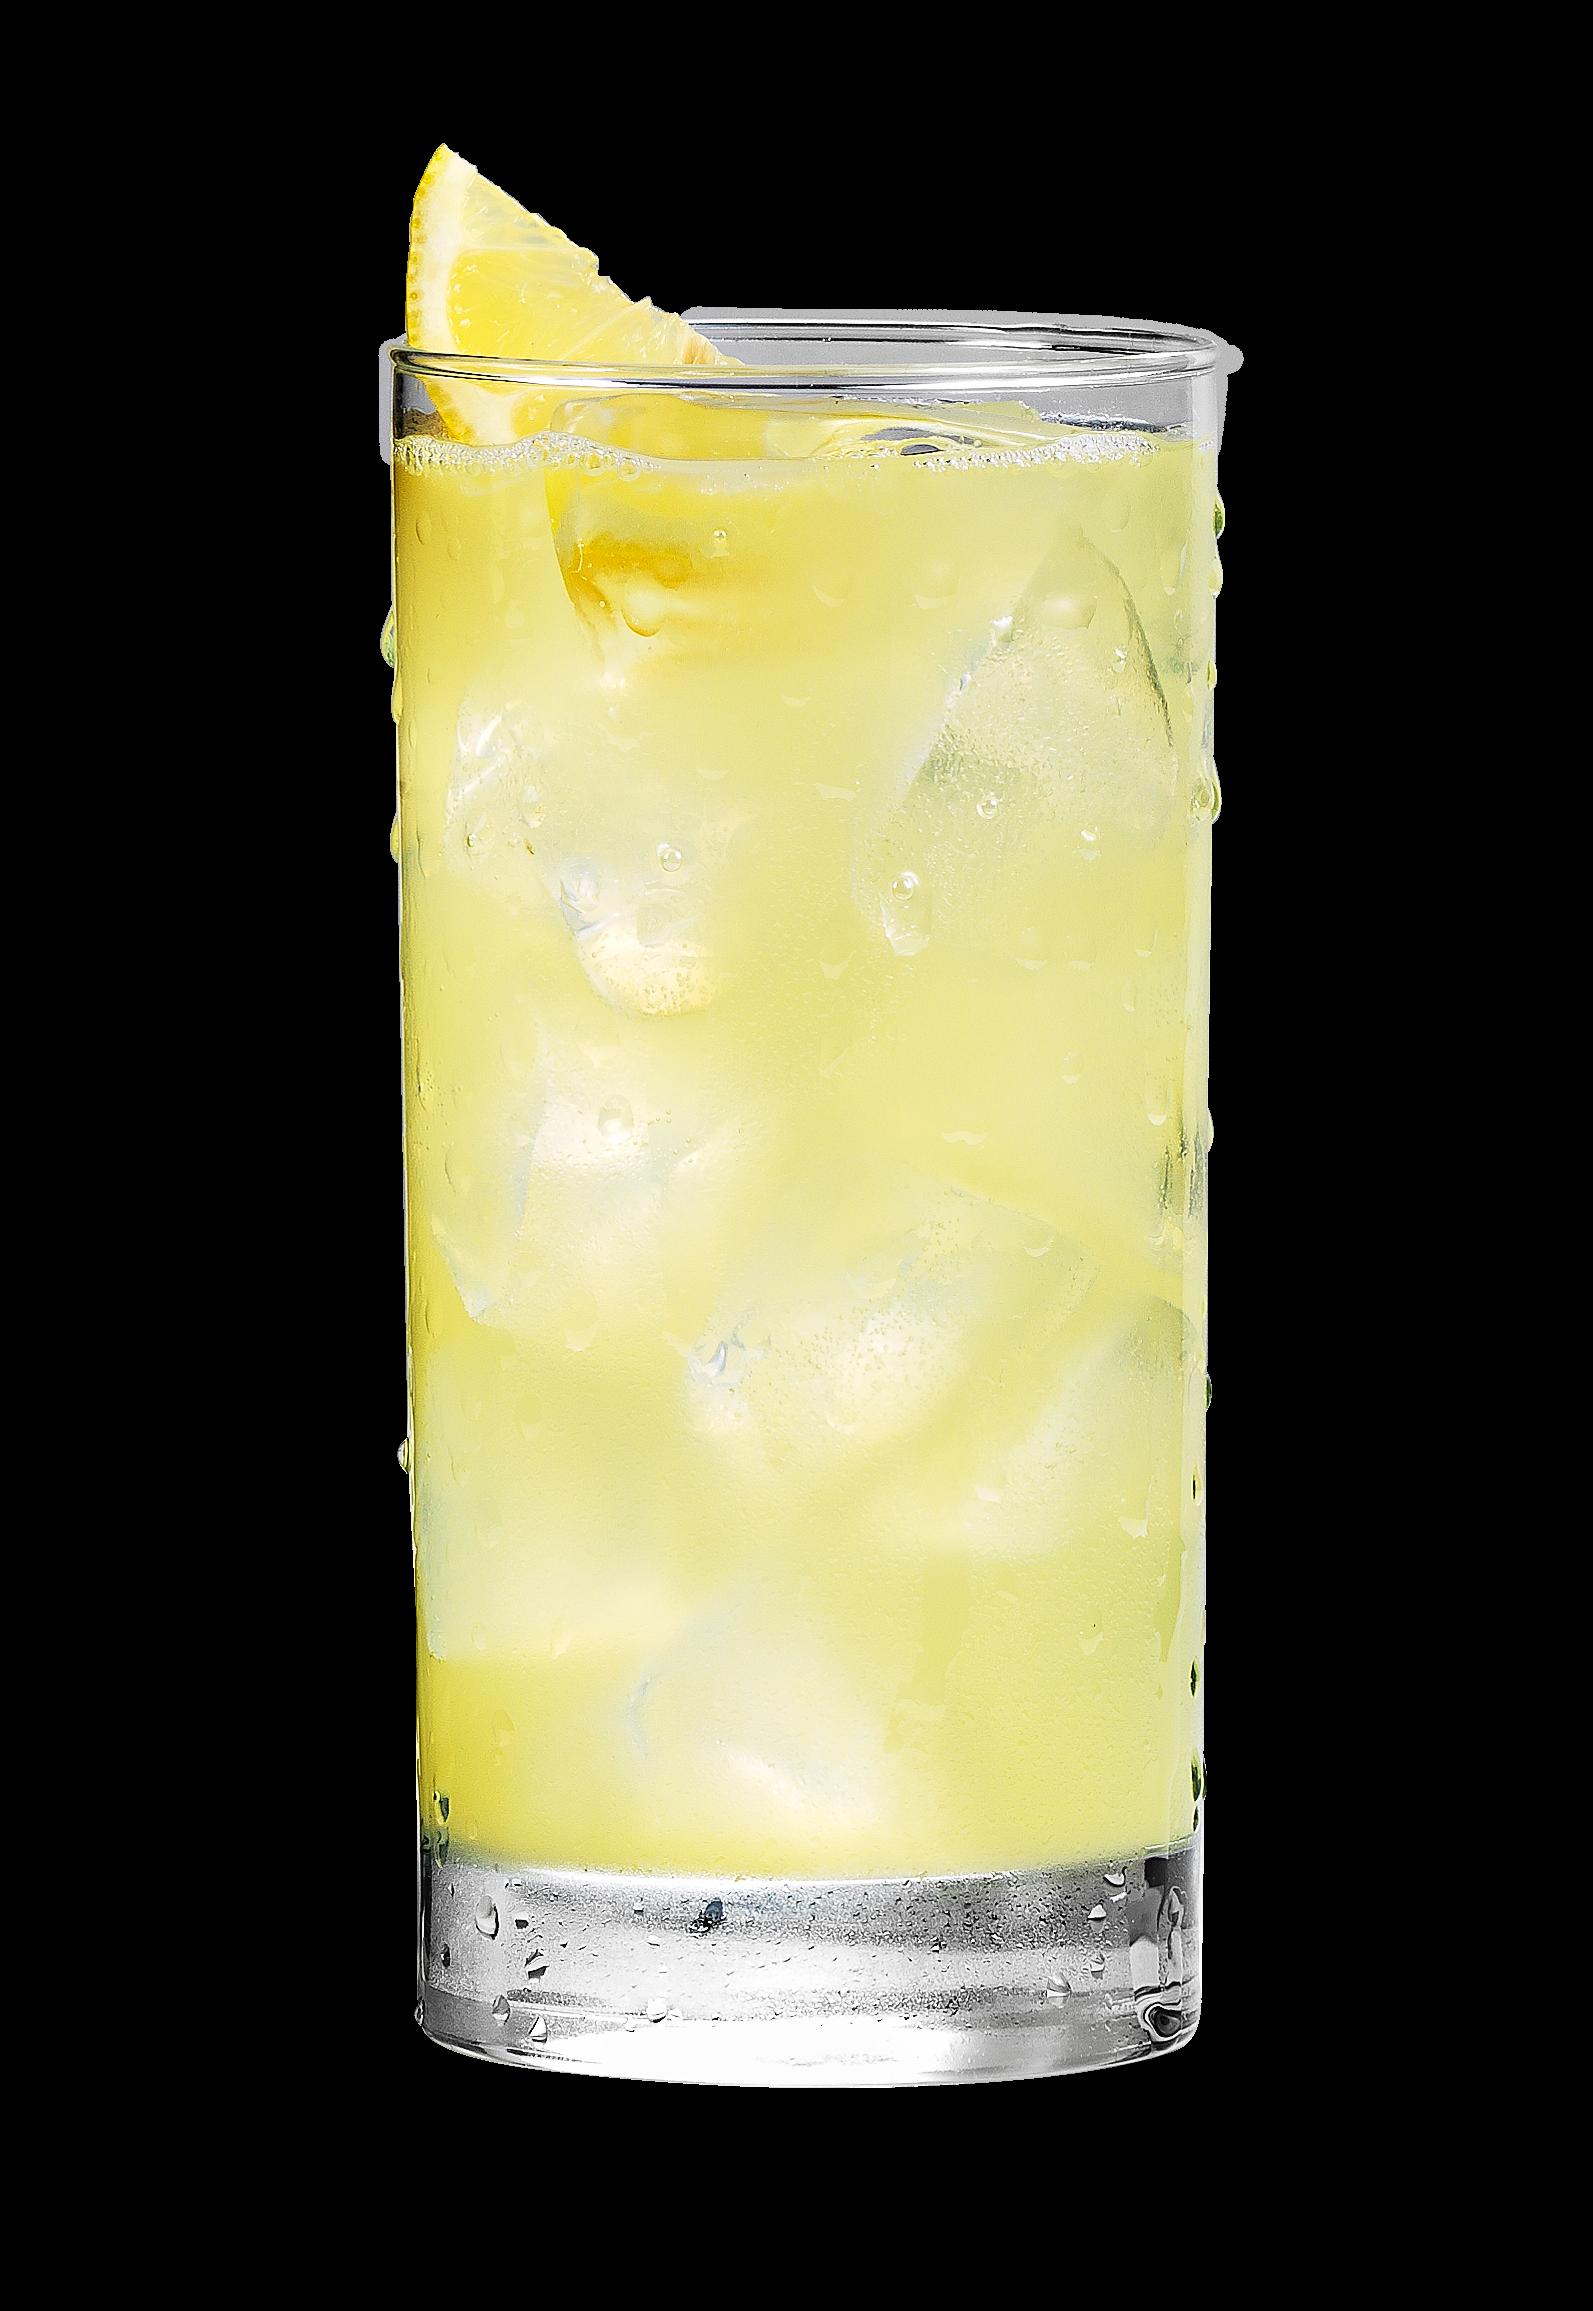 Copy of Bacardi Limonade